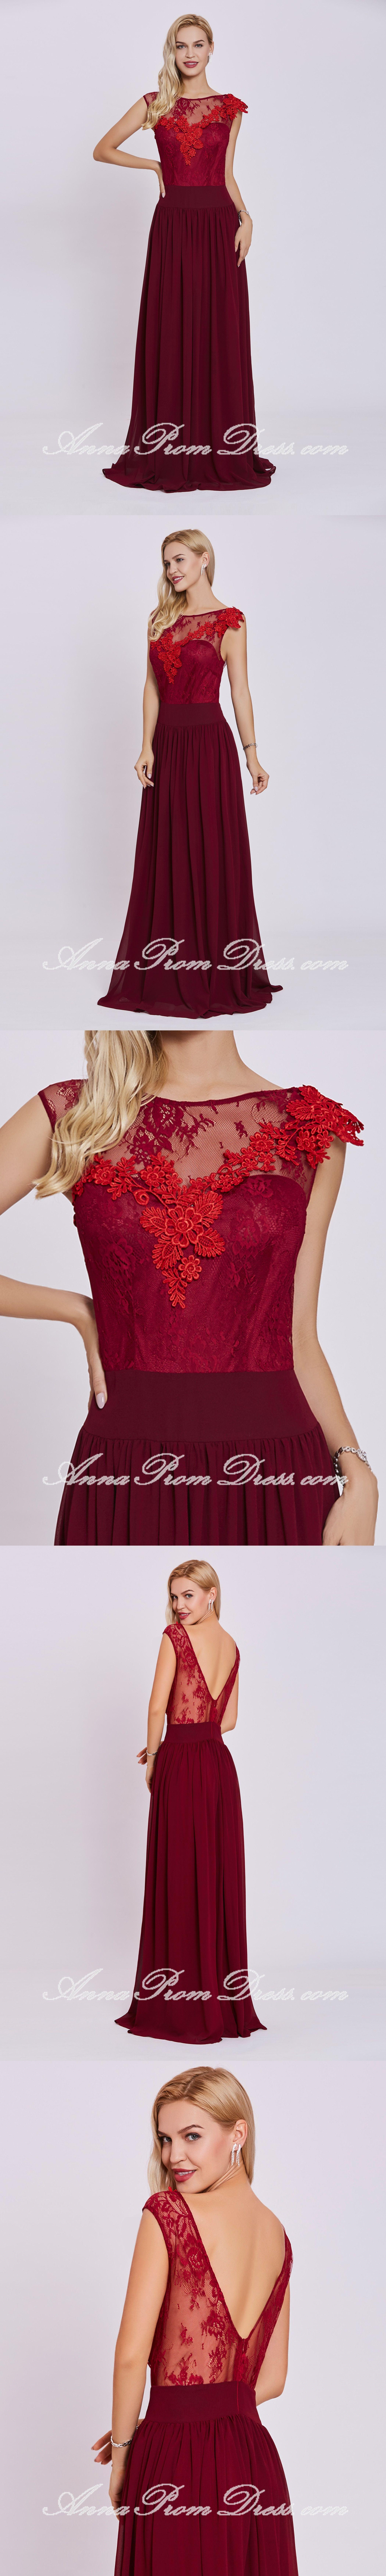 Burgundy prom dresses aline bateau floorlength lace long cheap